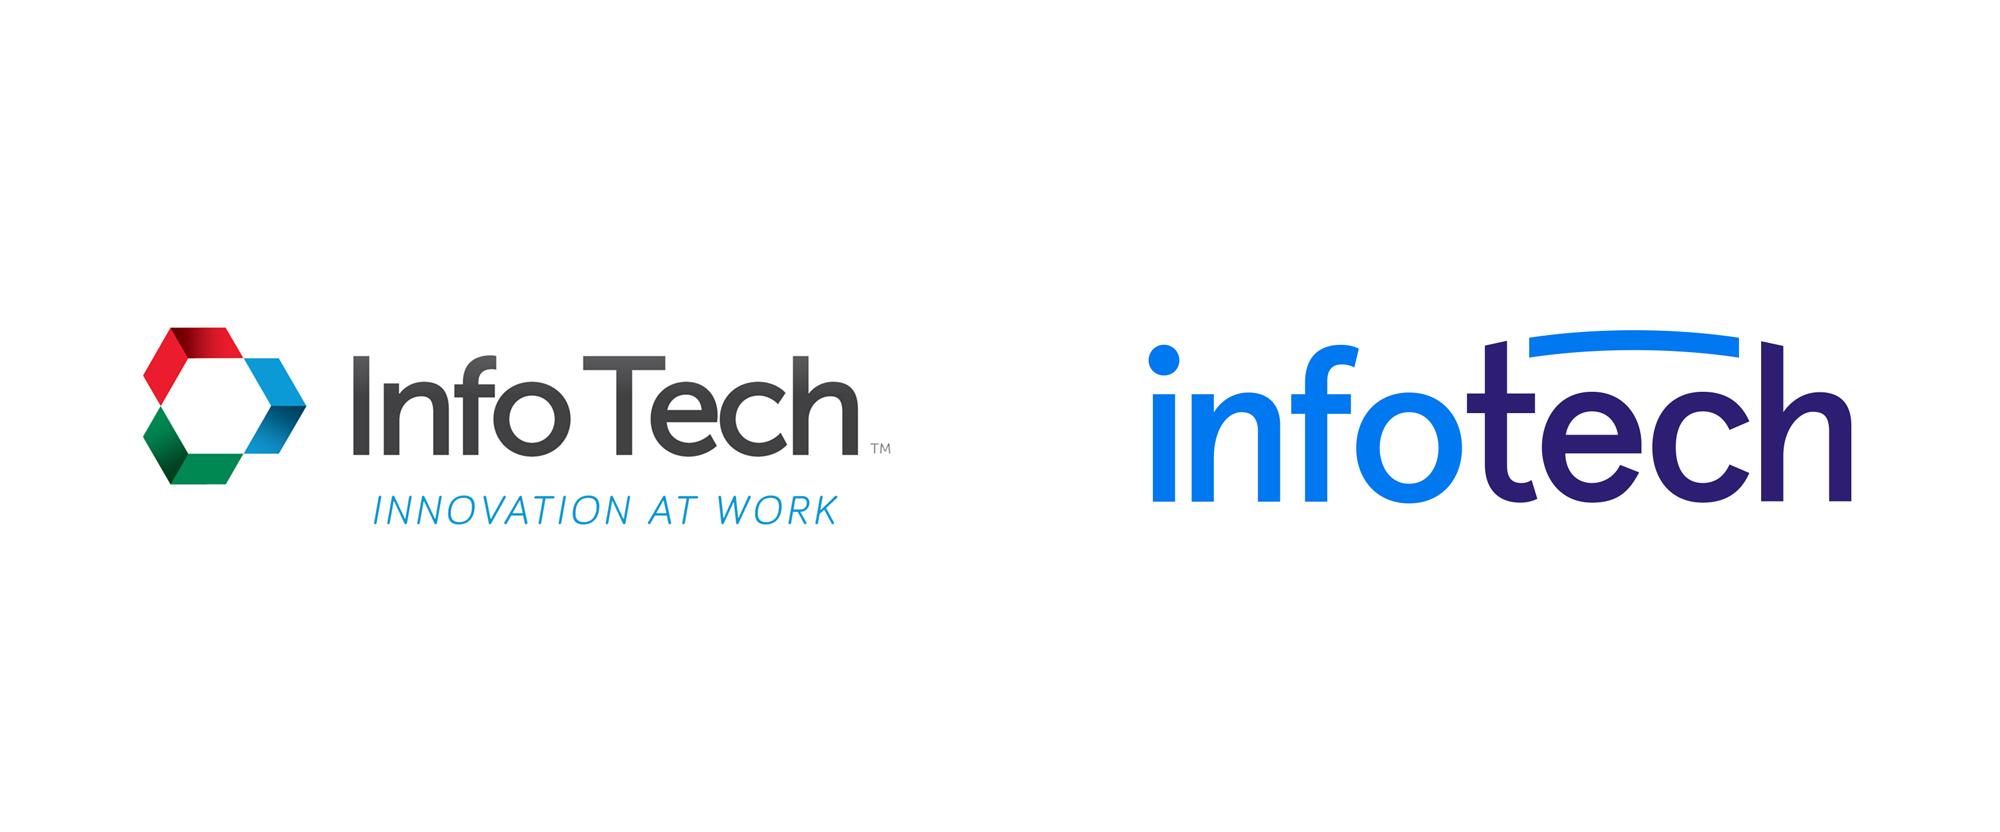 New Logo for Infotech by Bukwild